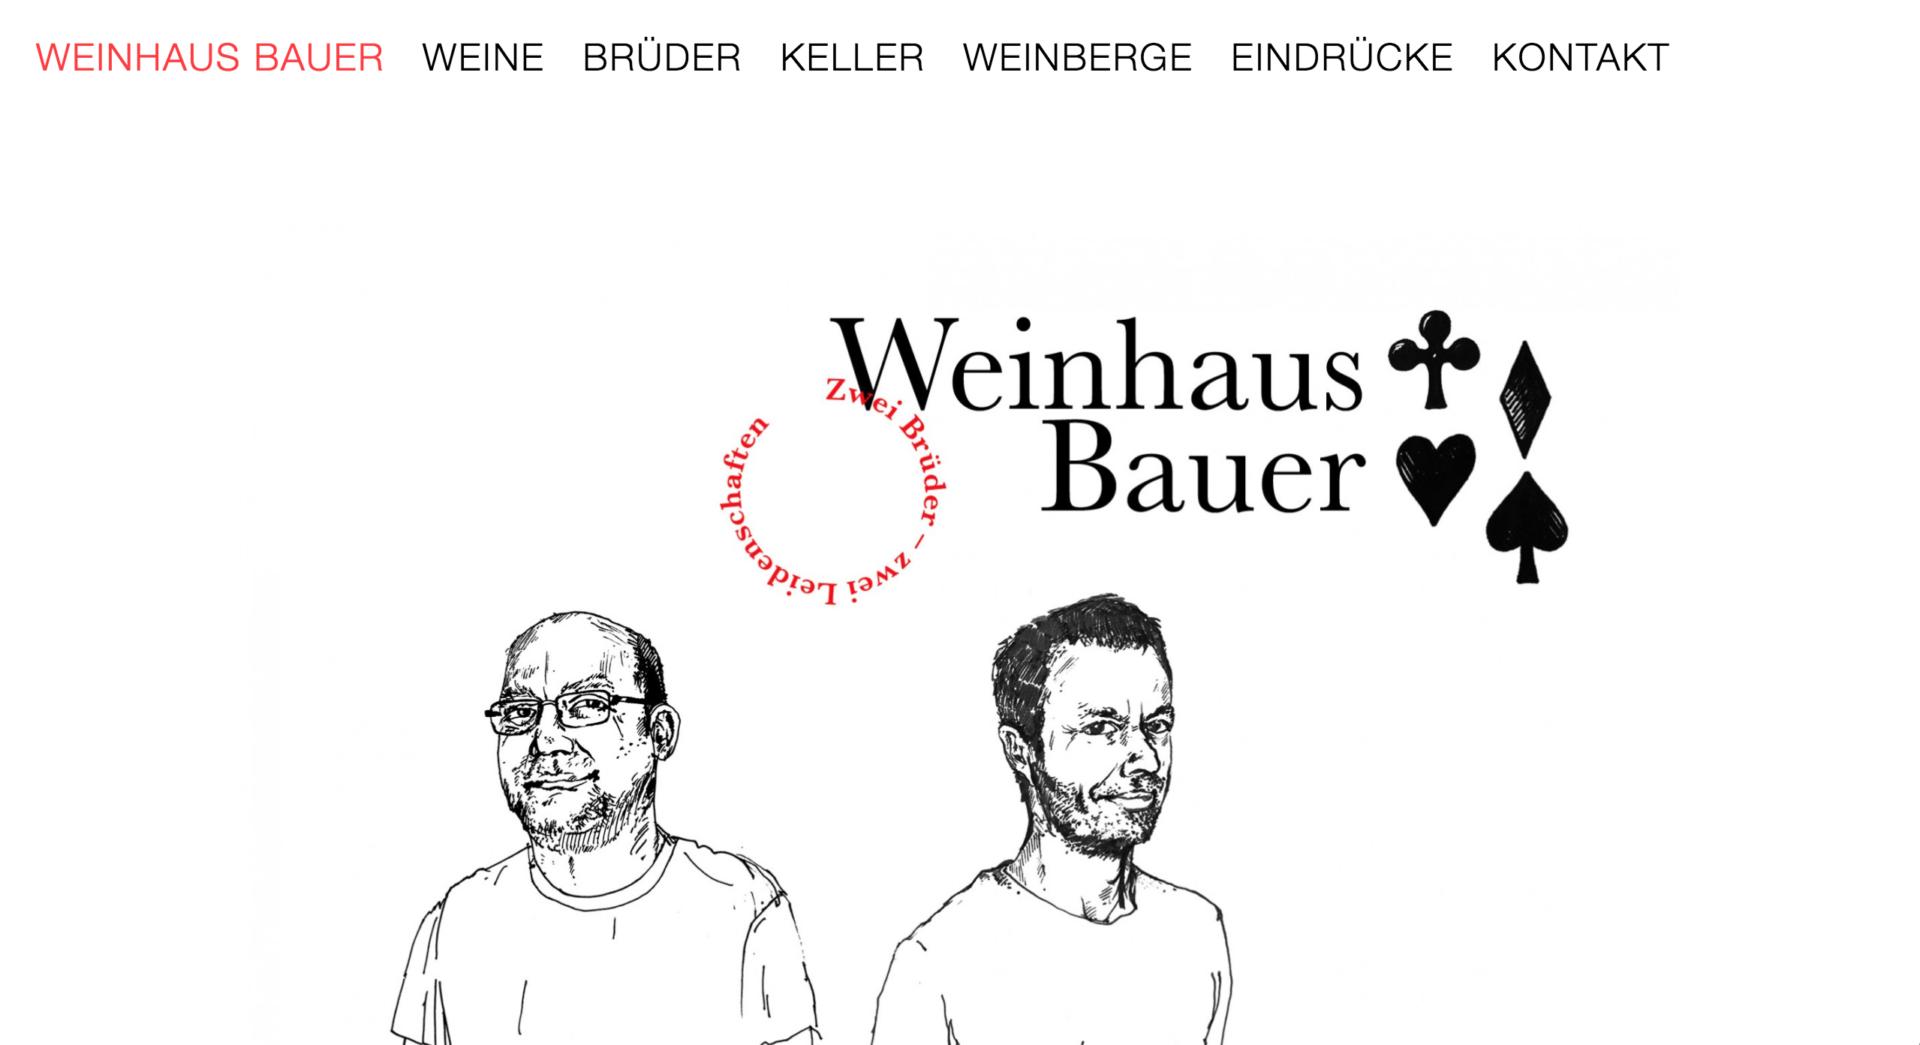 PAULINE BAUMBERGER Weinhaus Bauer